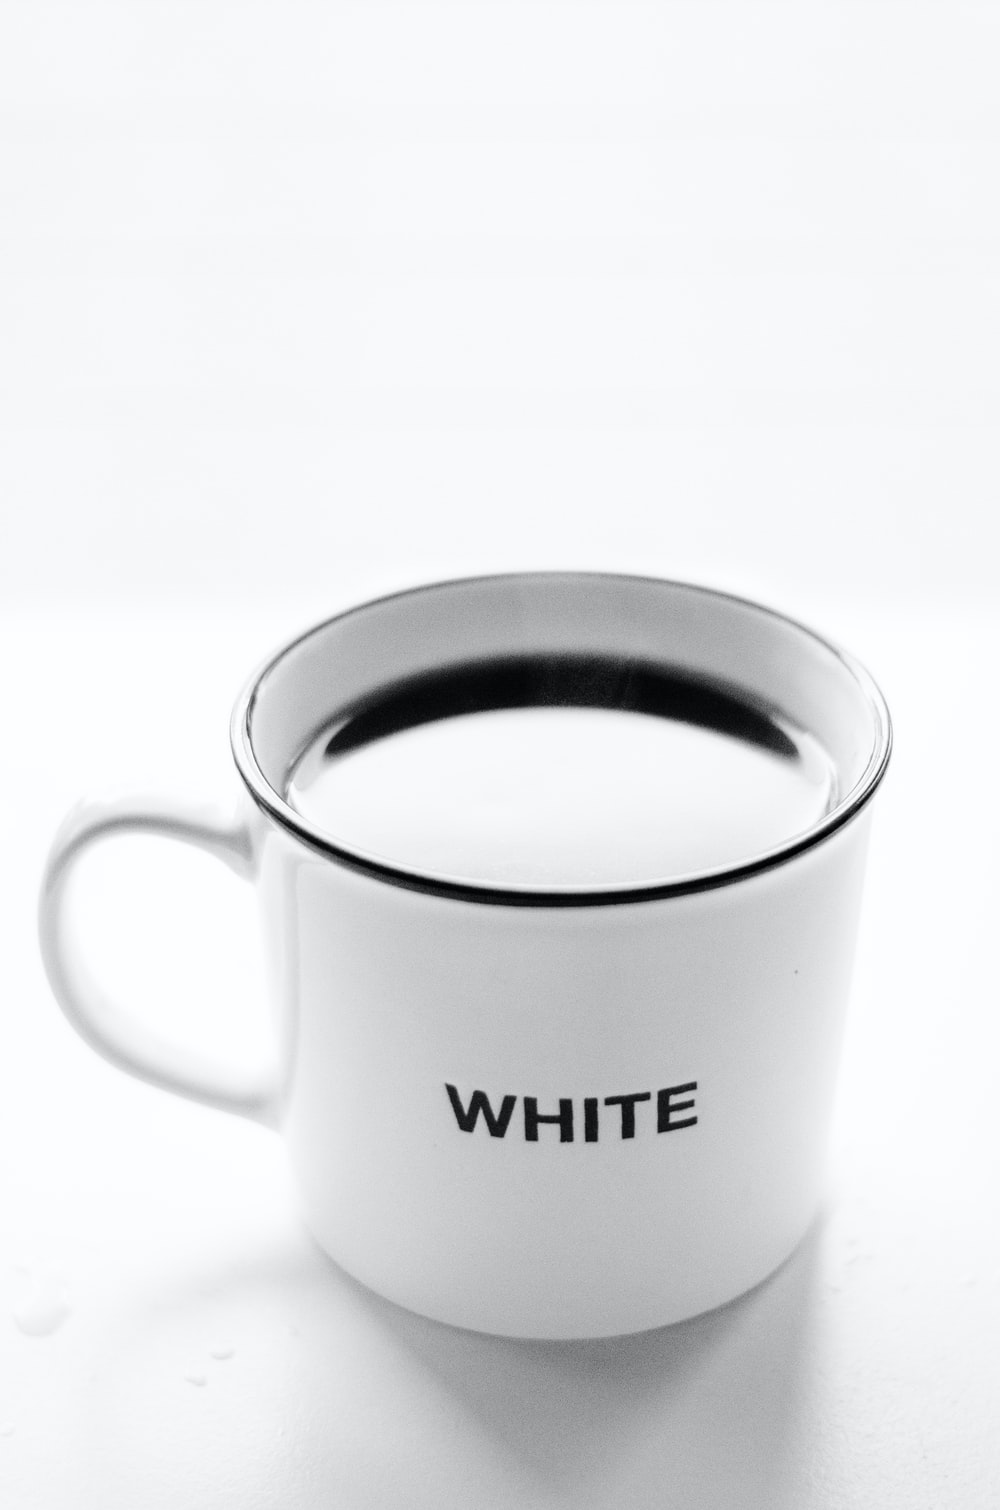 white and black ceramic mug with coffee